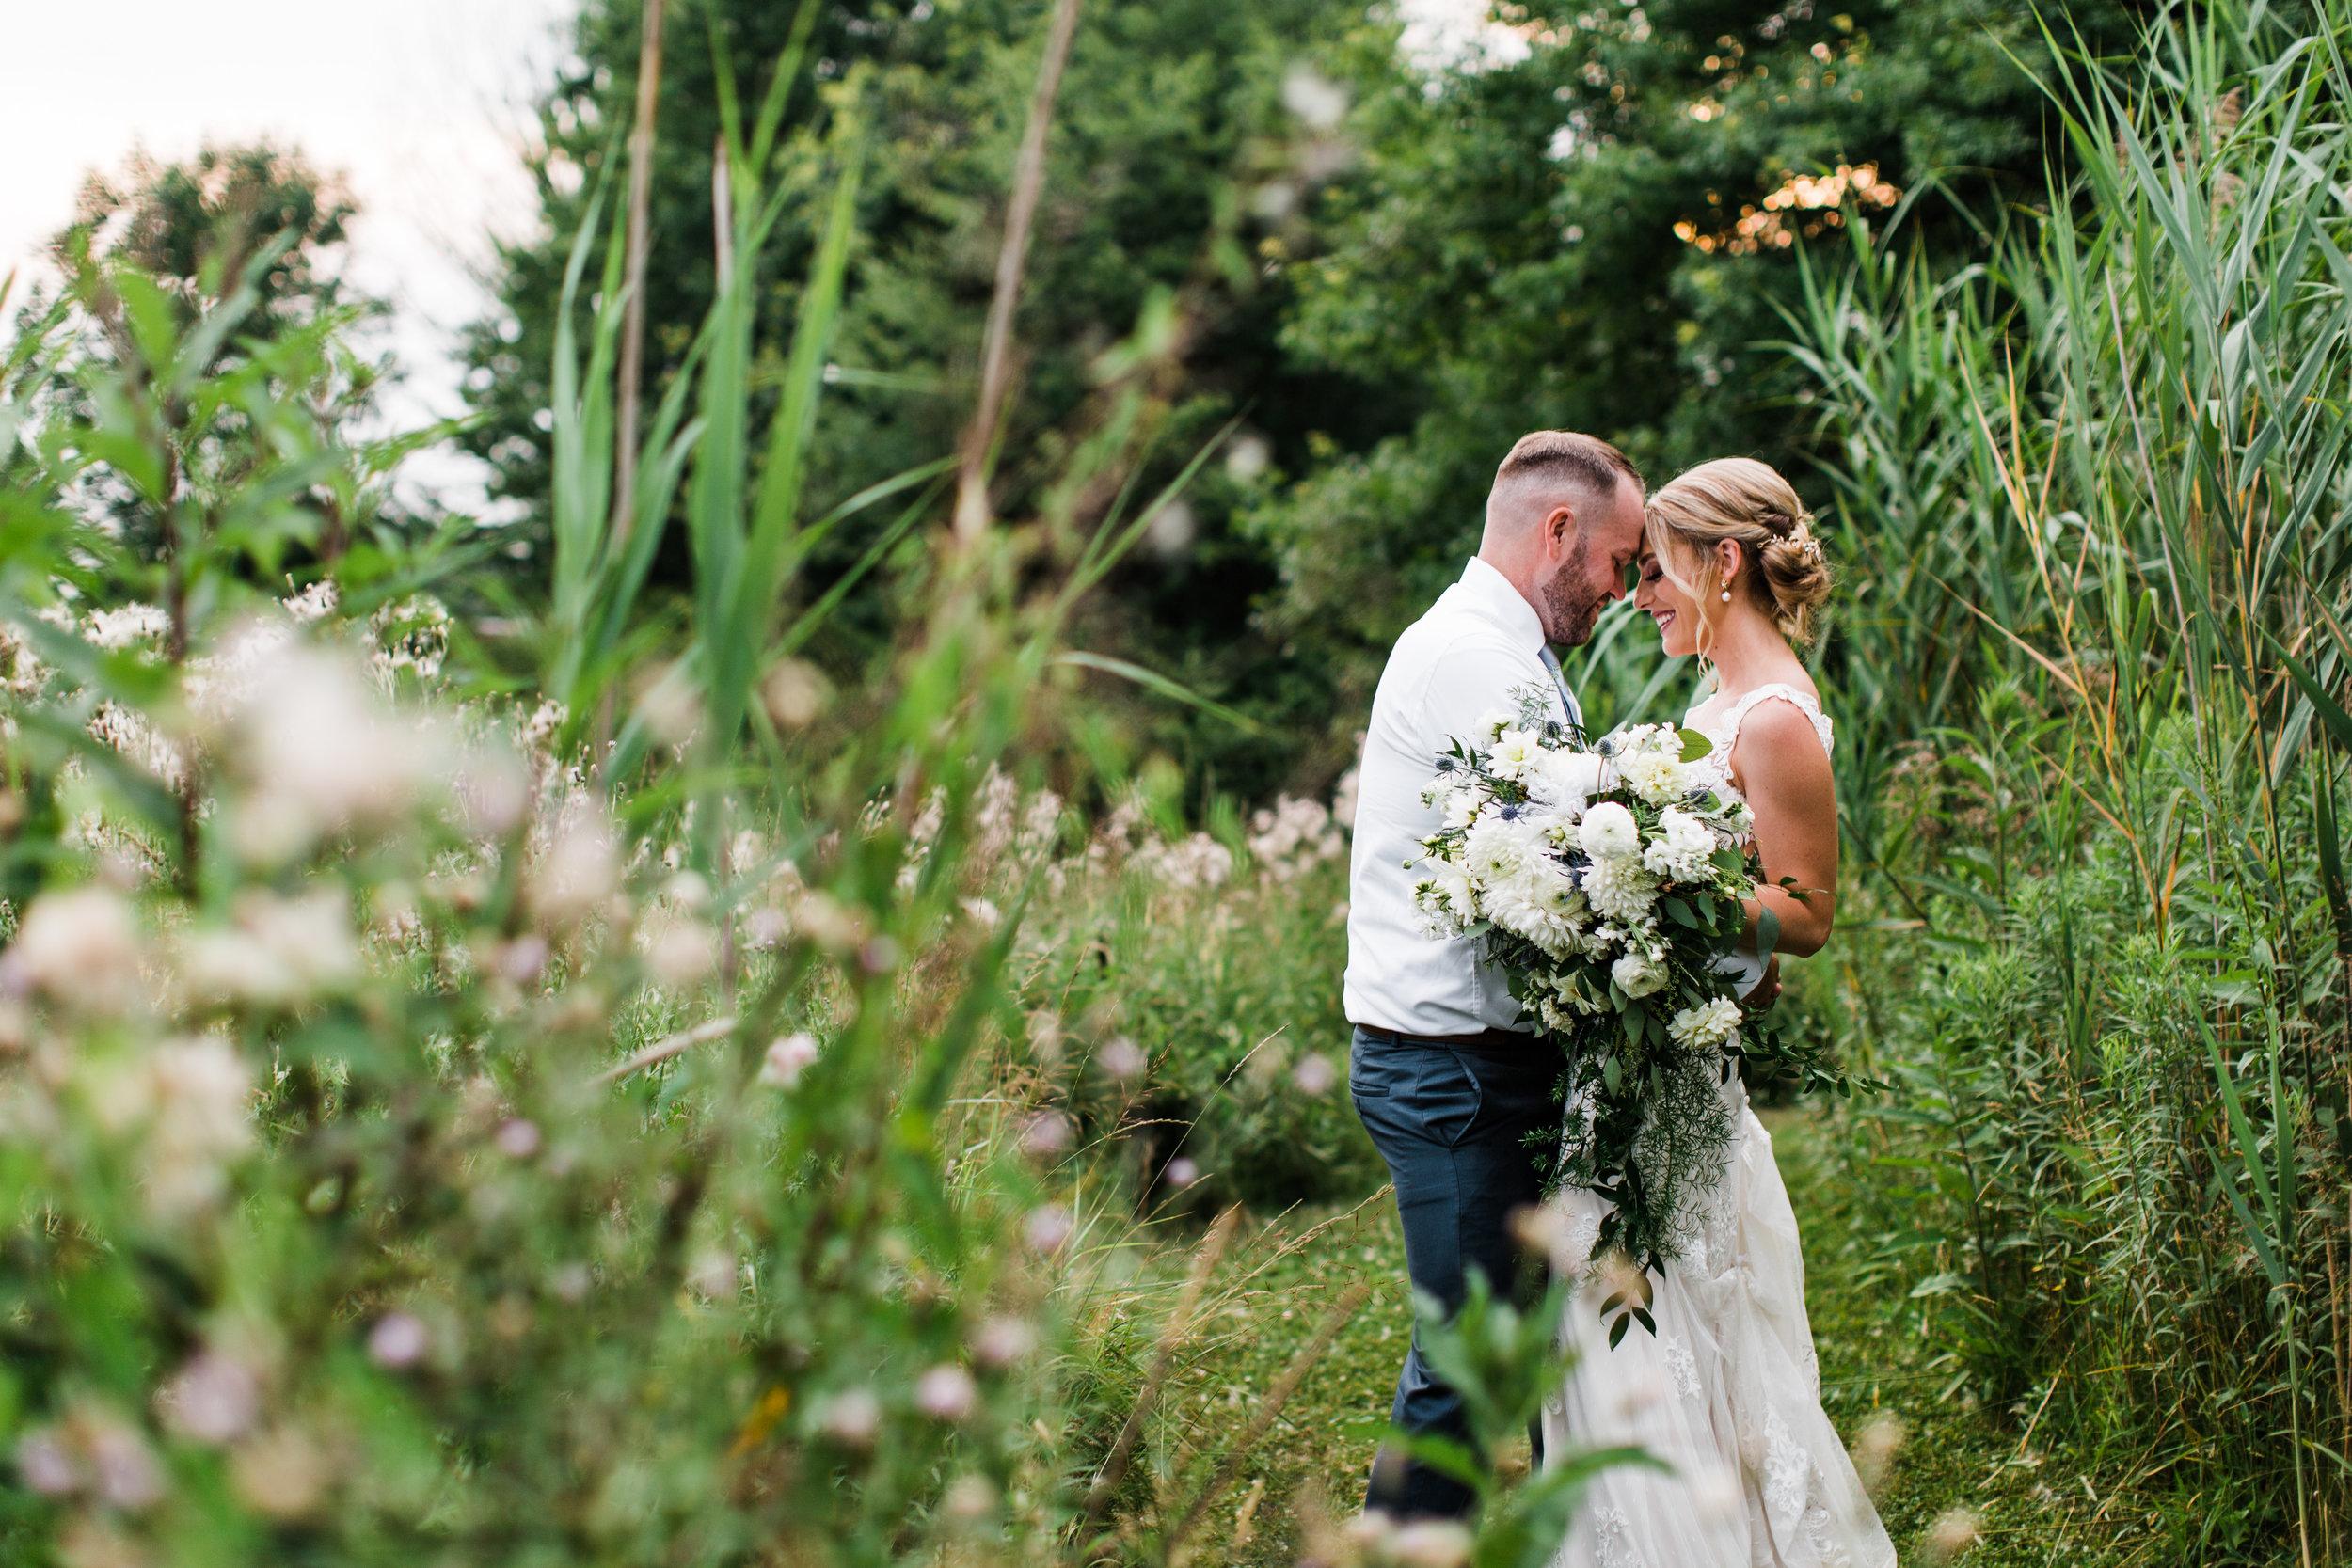 Lindsey-Ramdin-Ohio-Wedding-Photographer-9.jpg